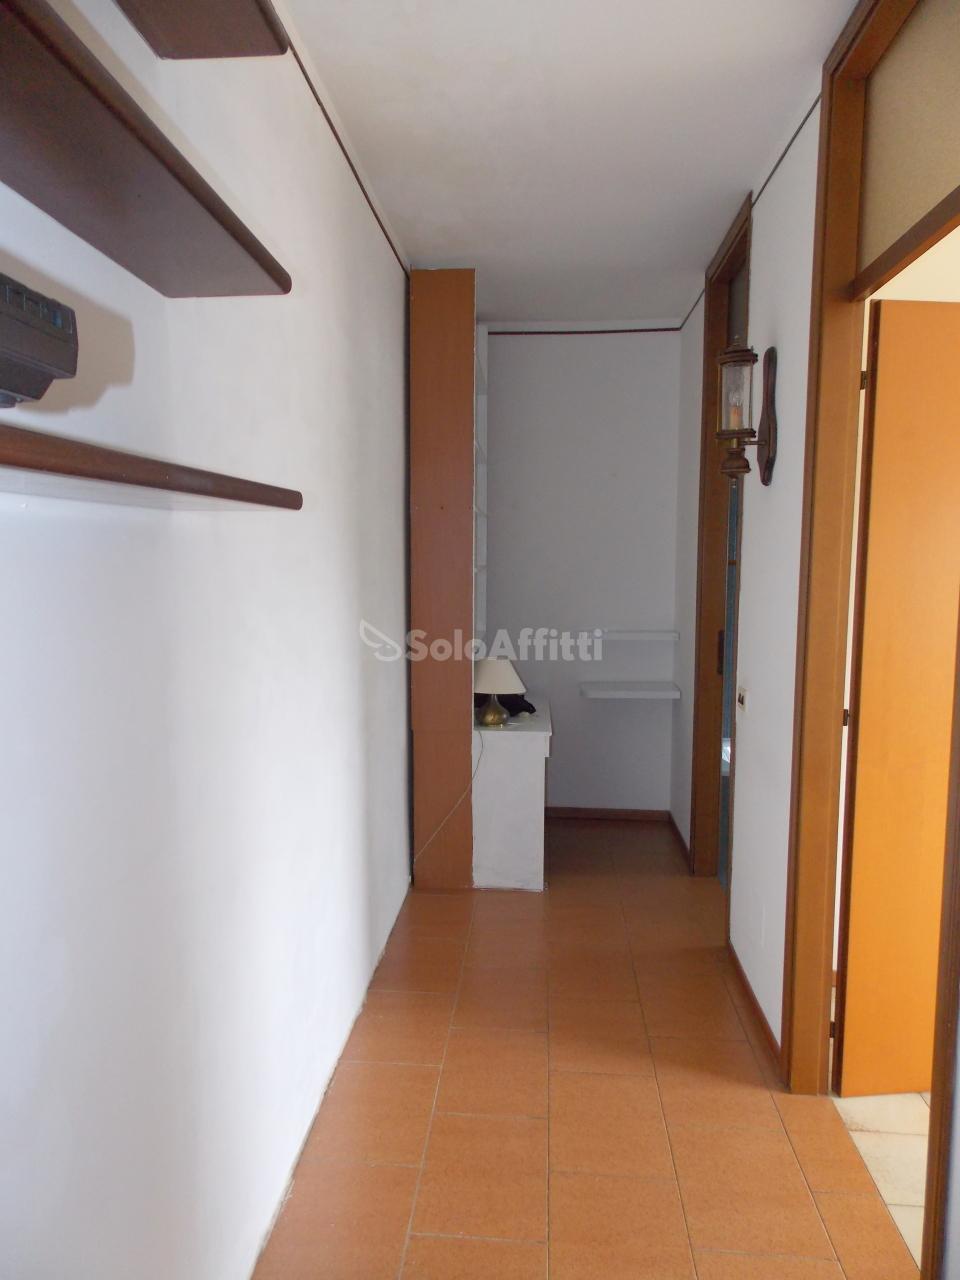 Bilocale Novara Via Laurana  8 5